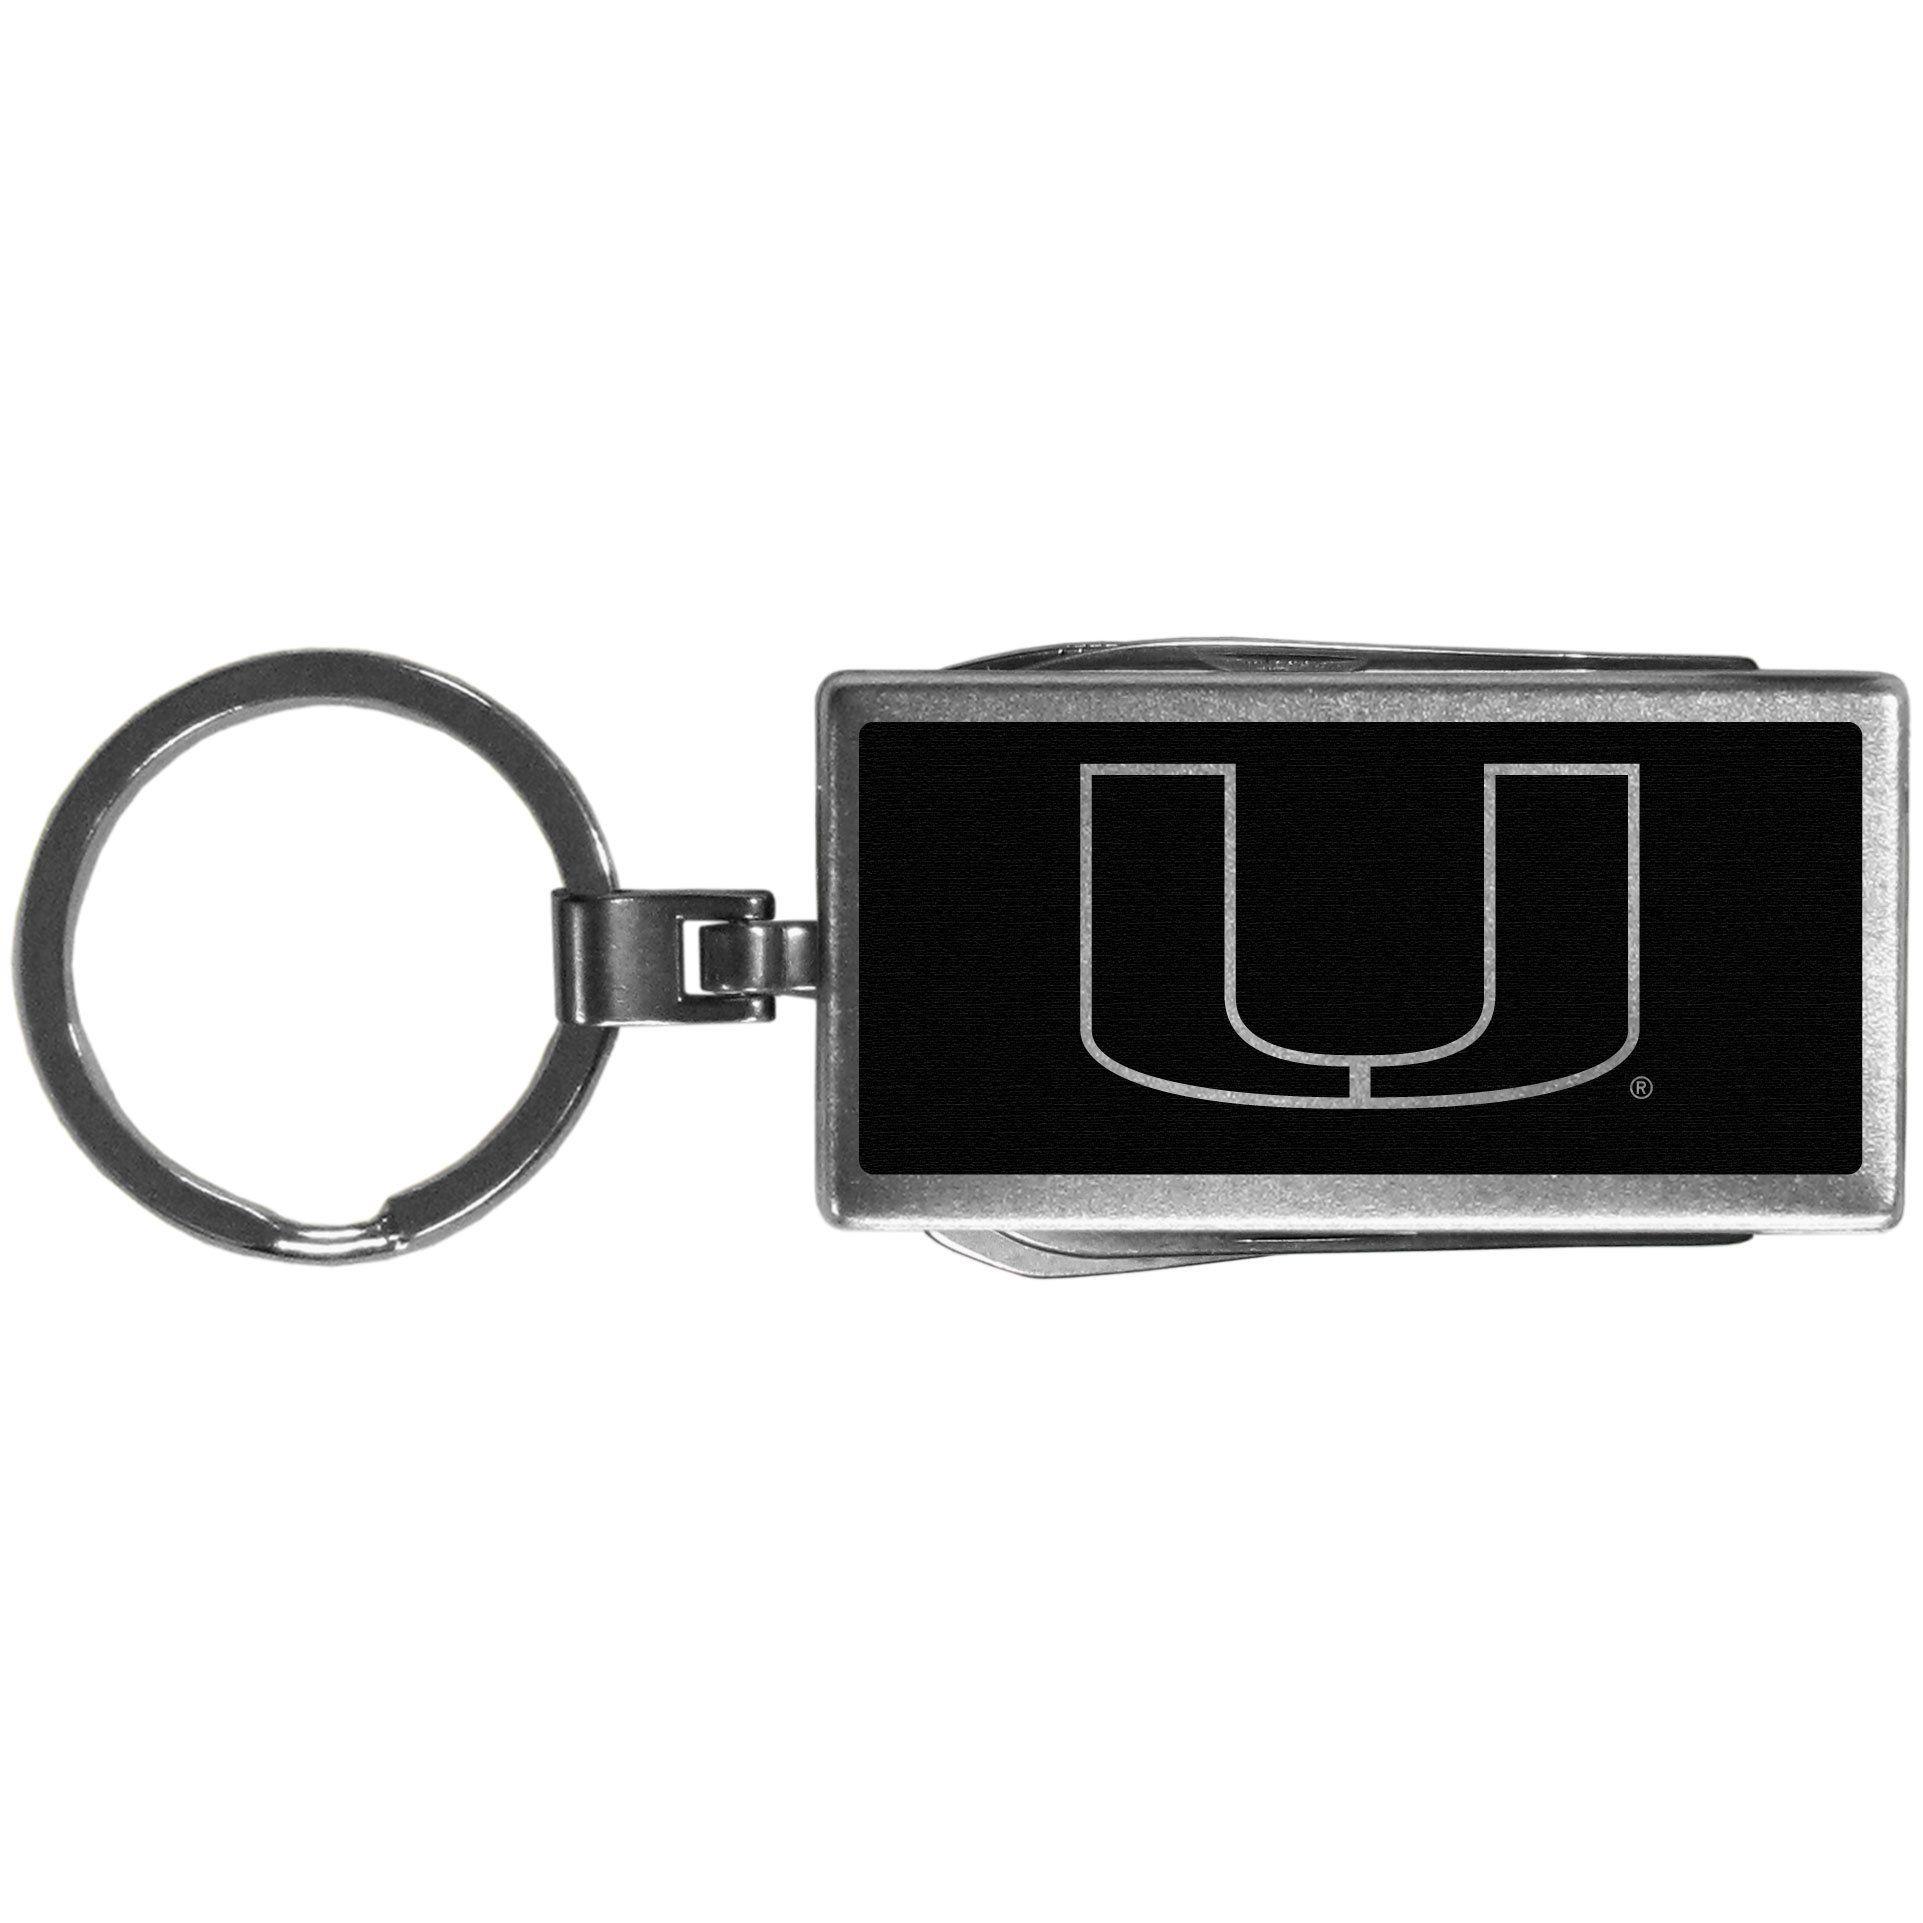 Siskiyou NCAA Square Key Chain Miami Hurricanes Black